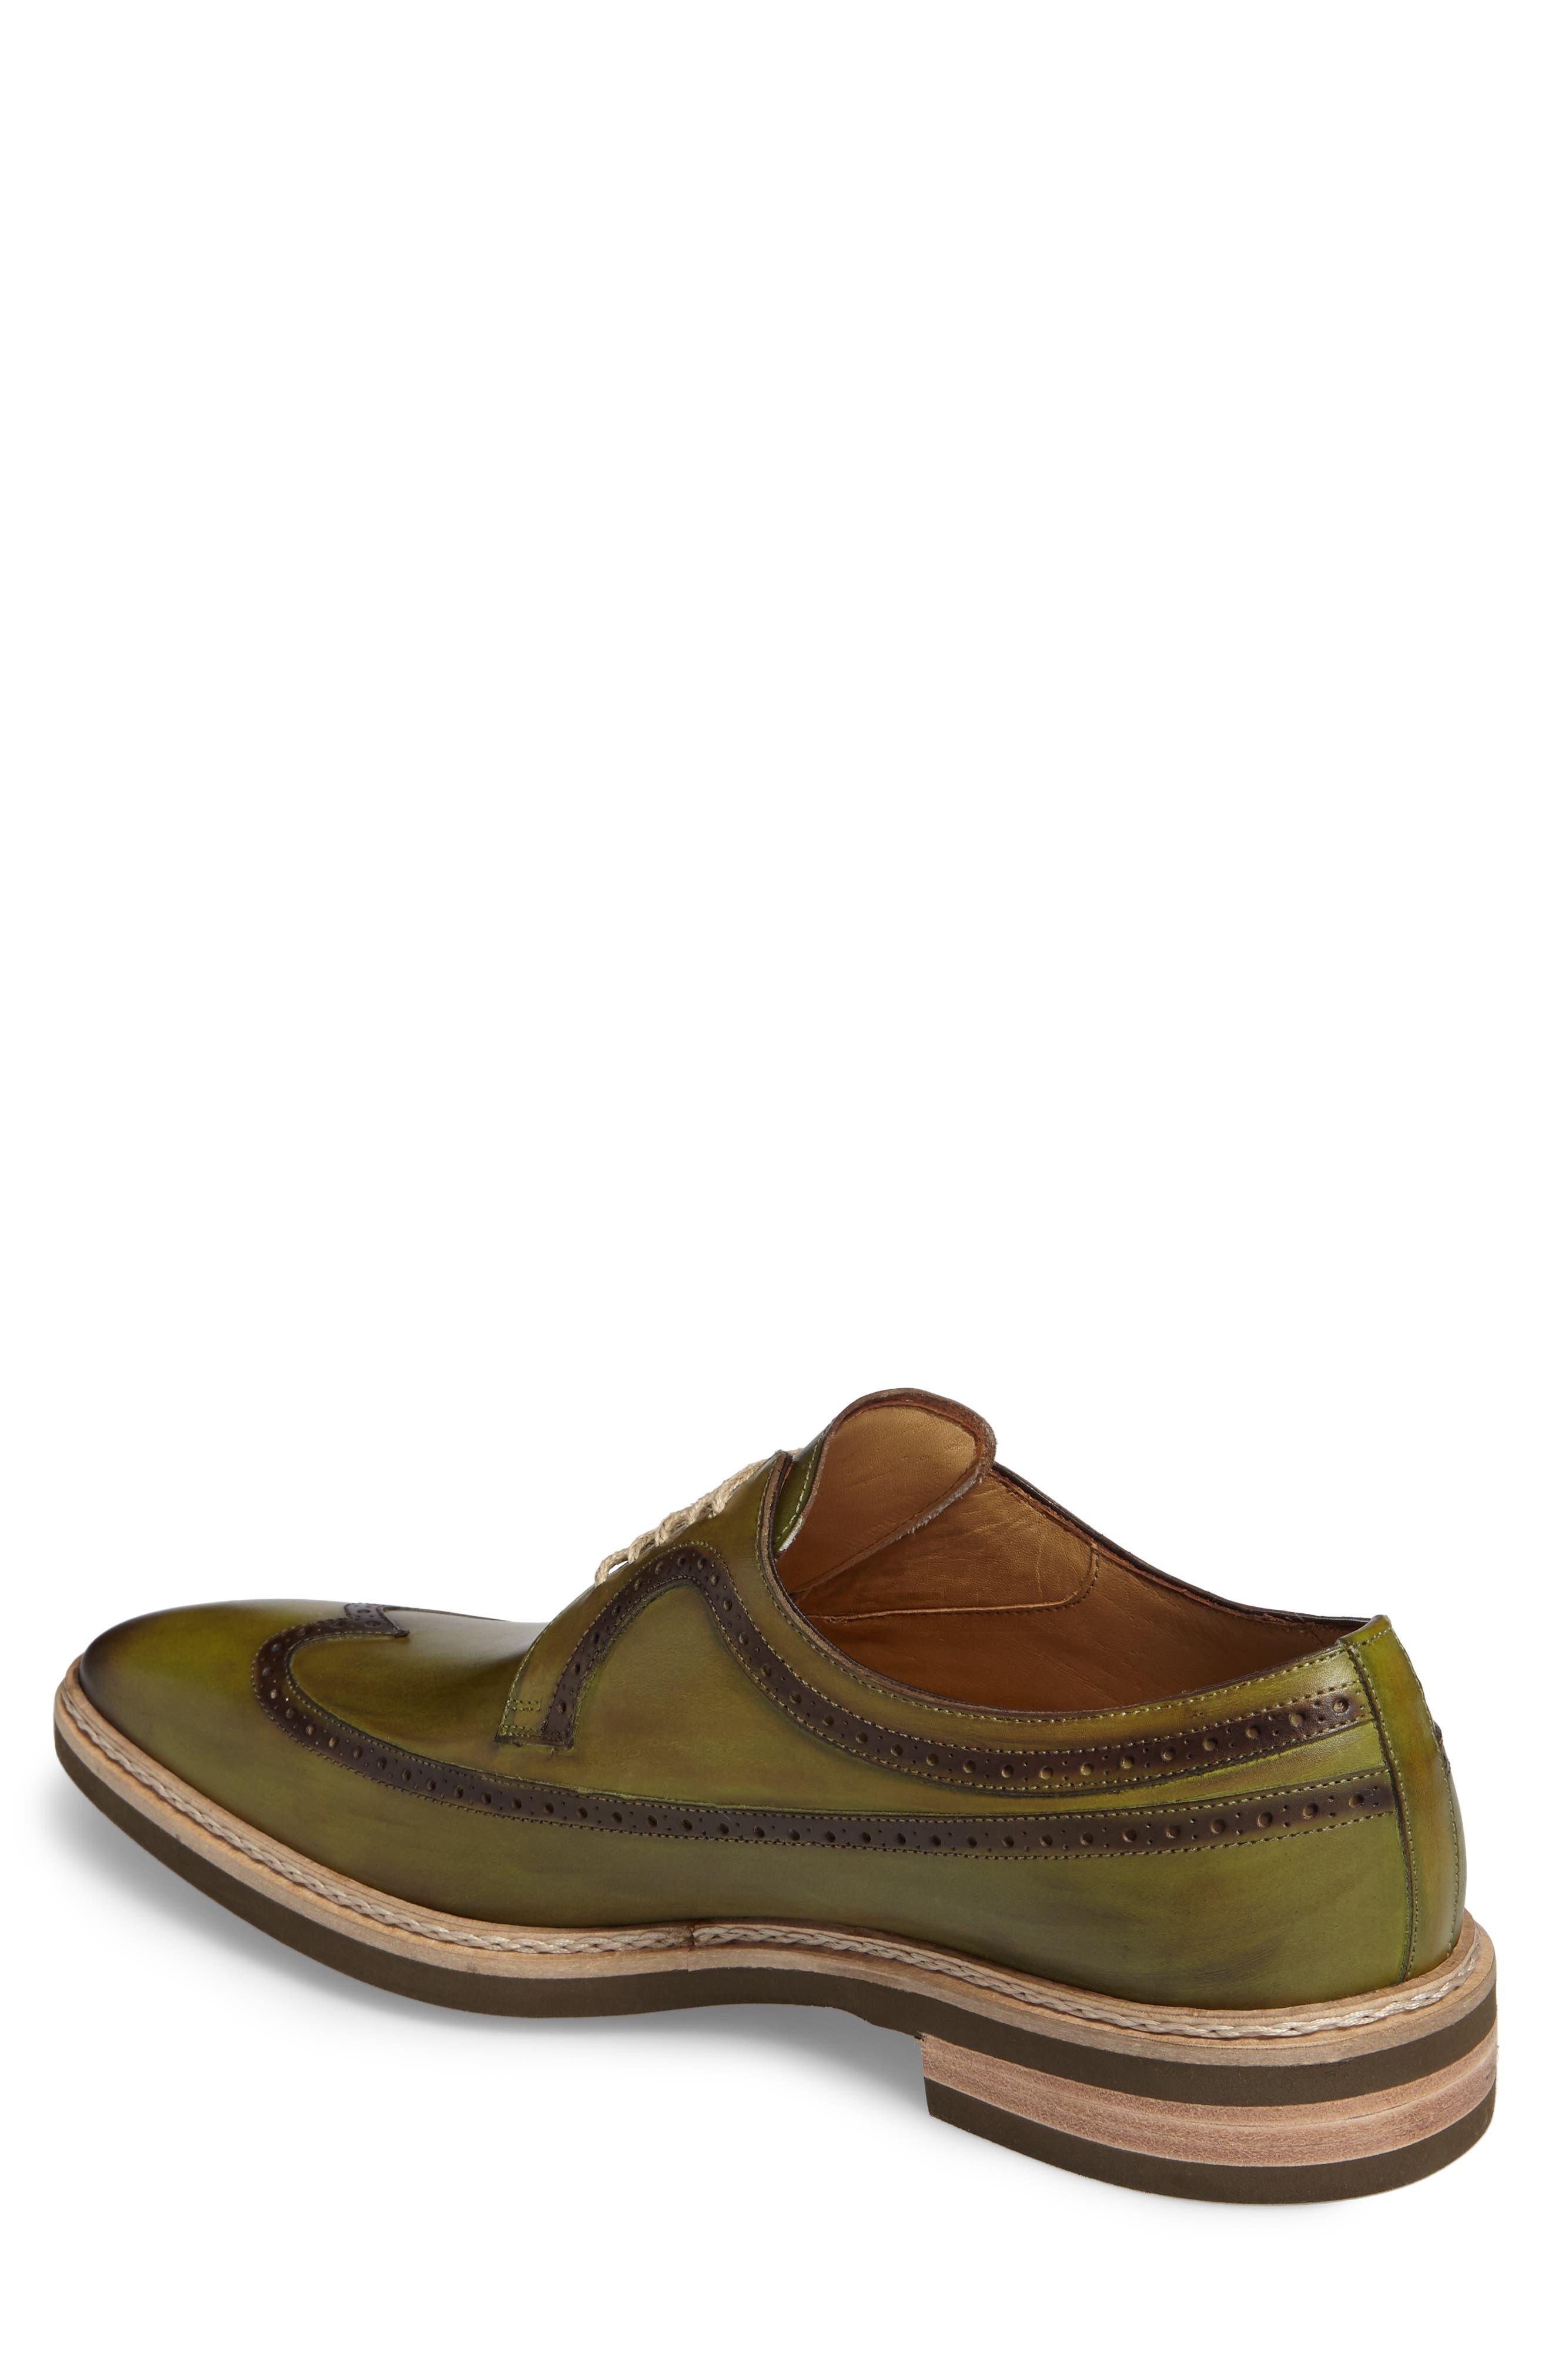 Maraval Wingtip,                             Alternate thumbnail 2, color,                             Olive Leather